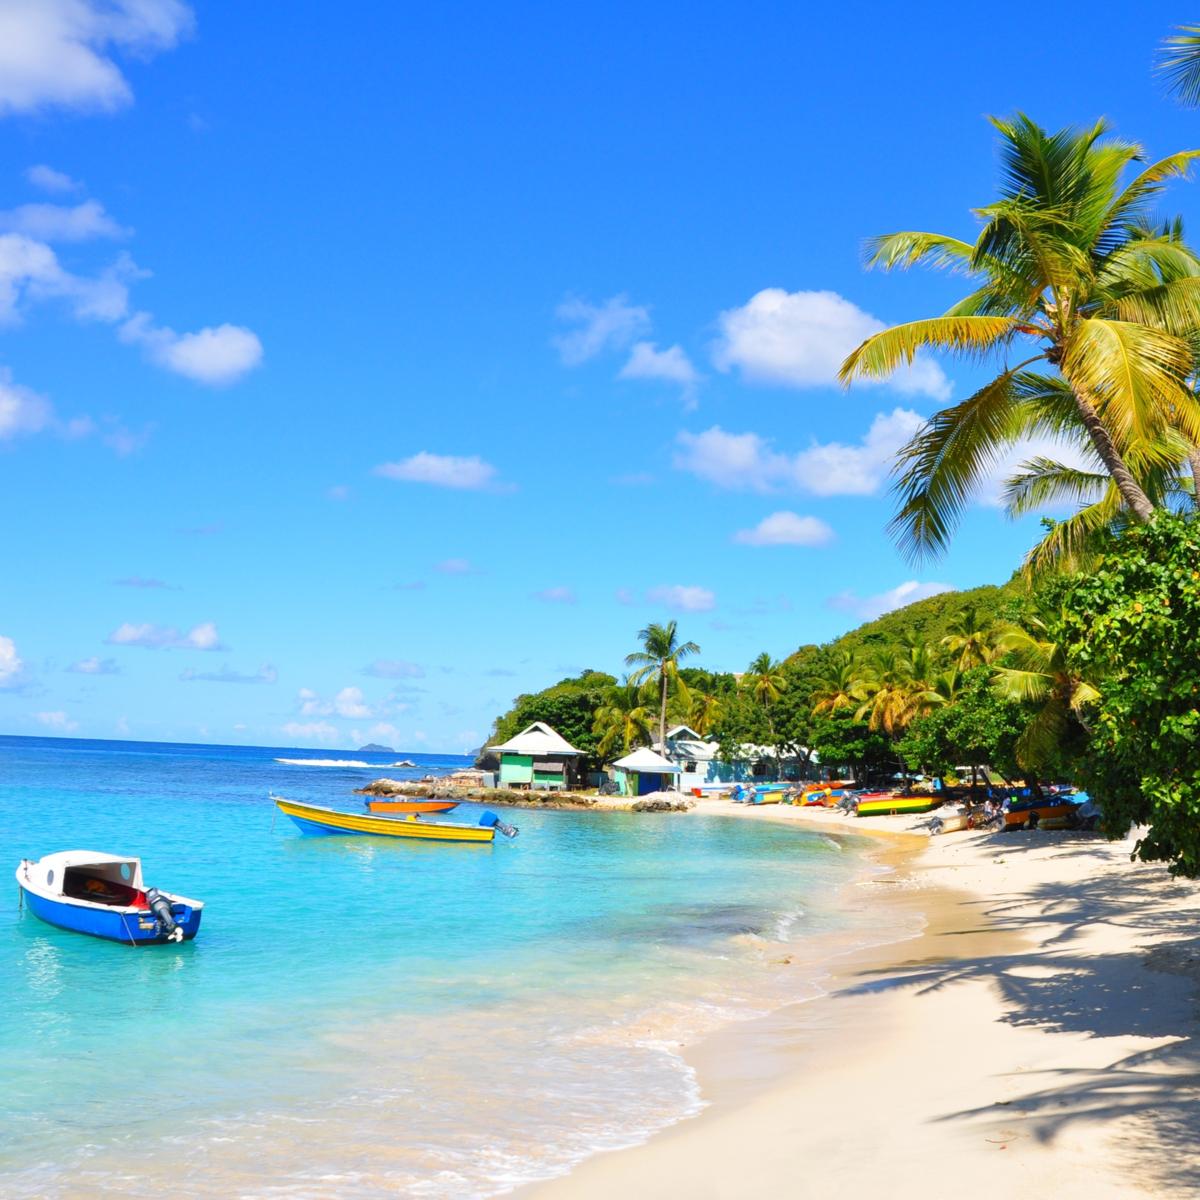 Sant Vincent and Grenadine